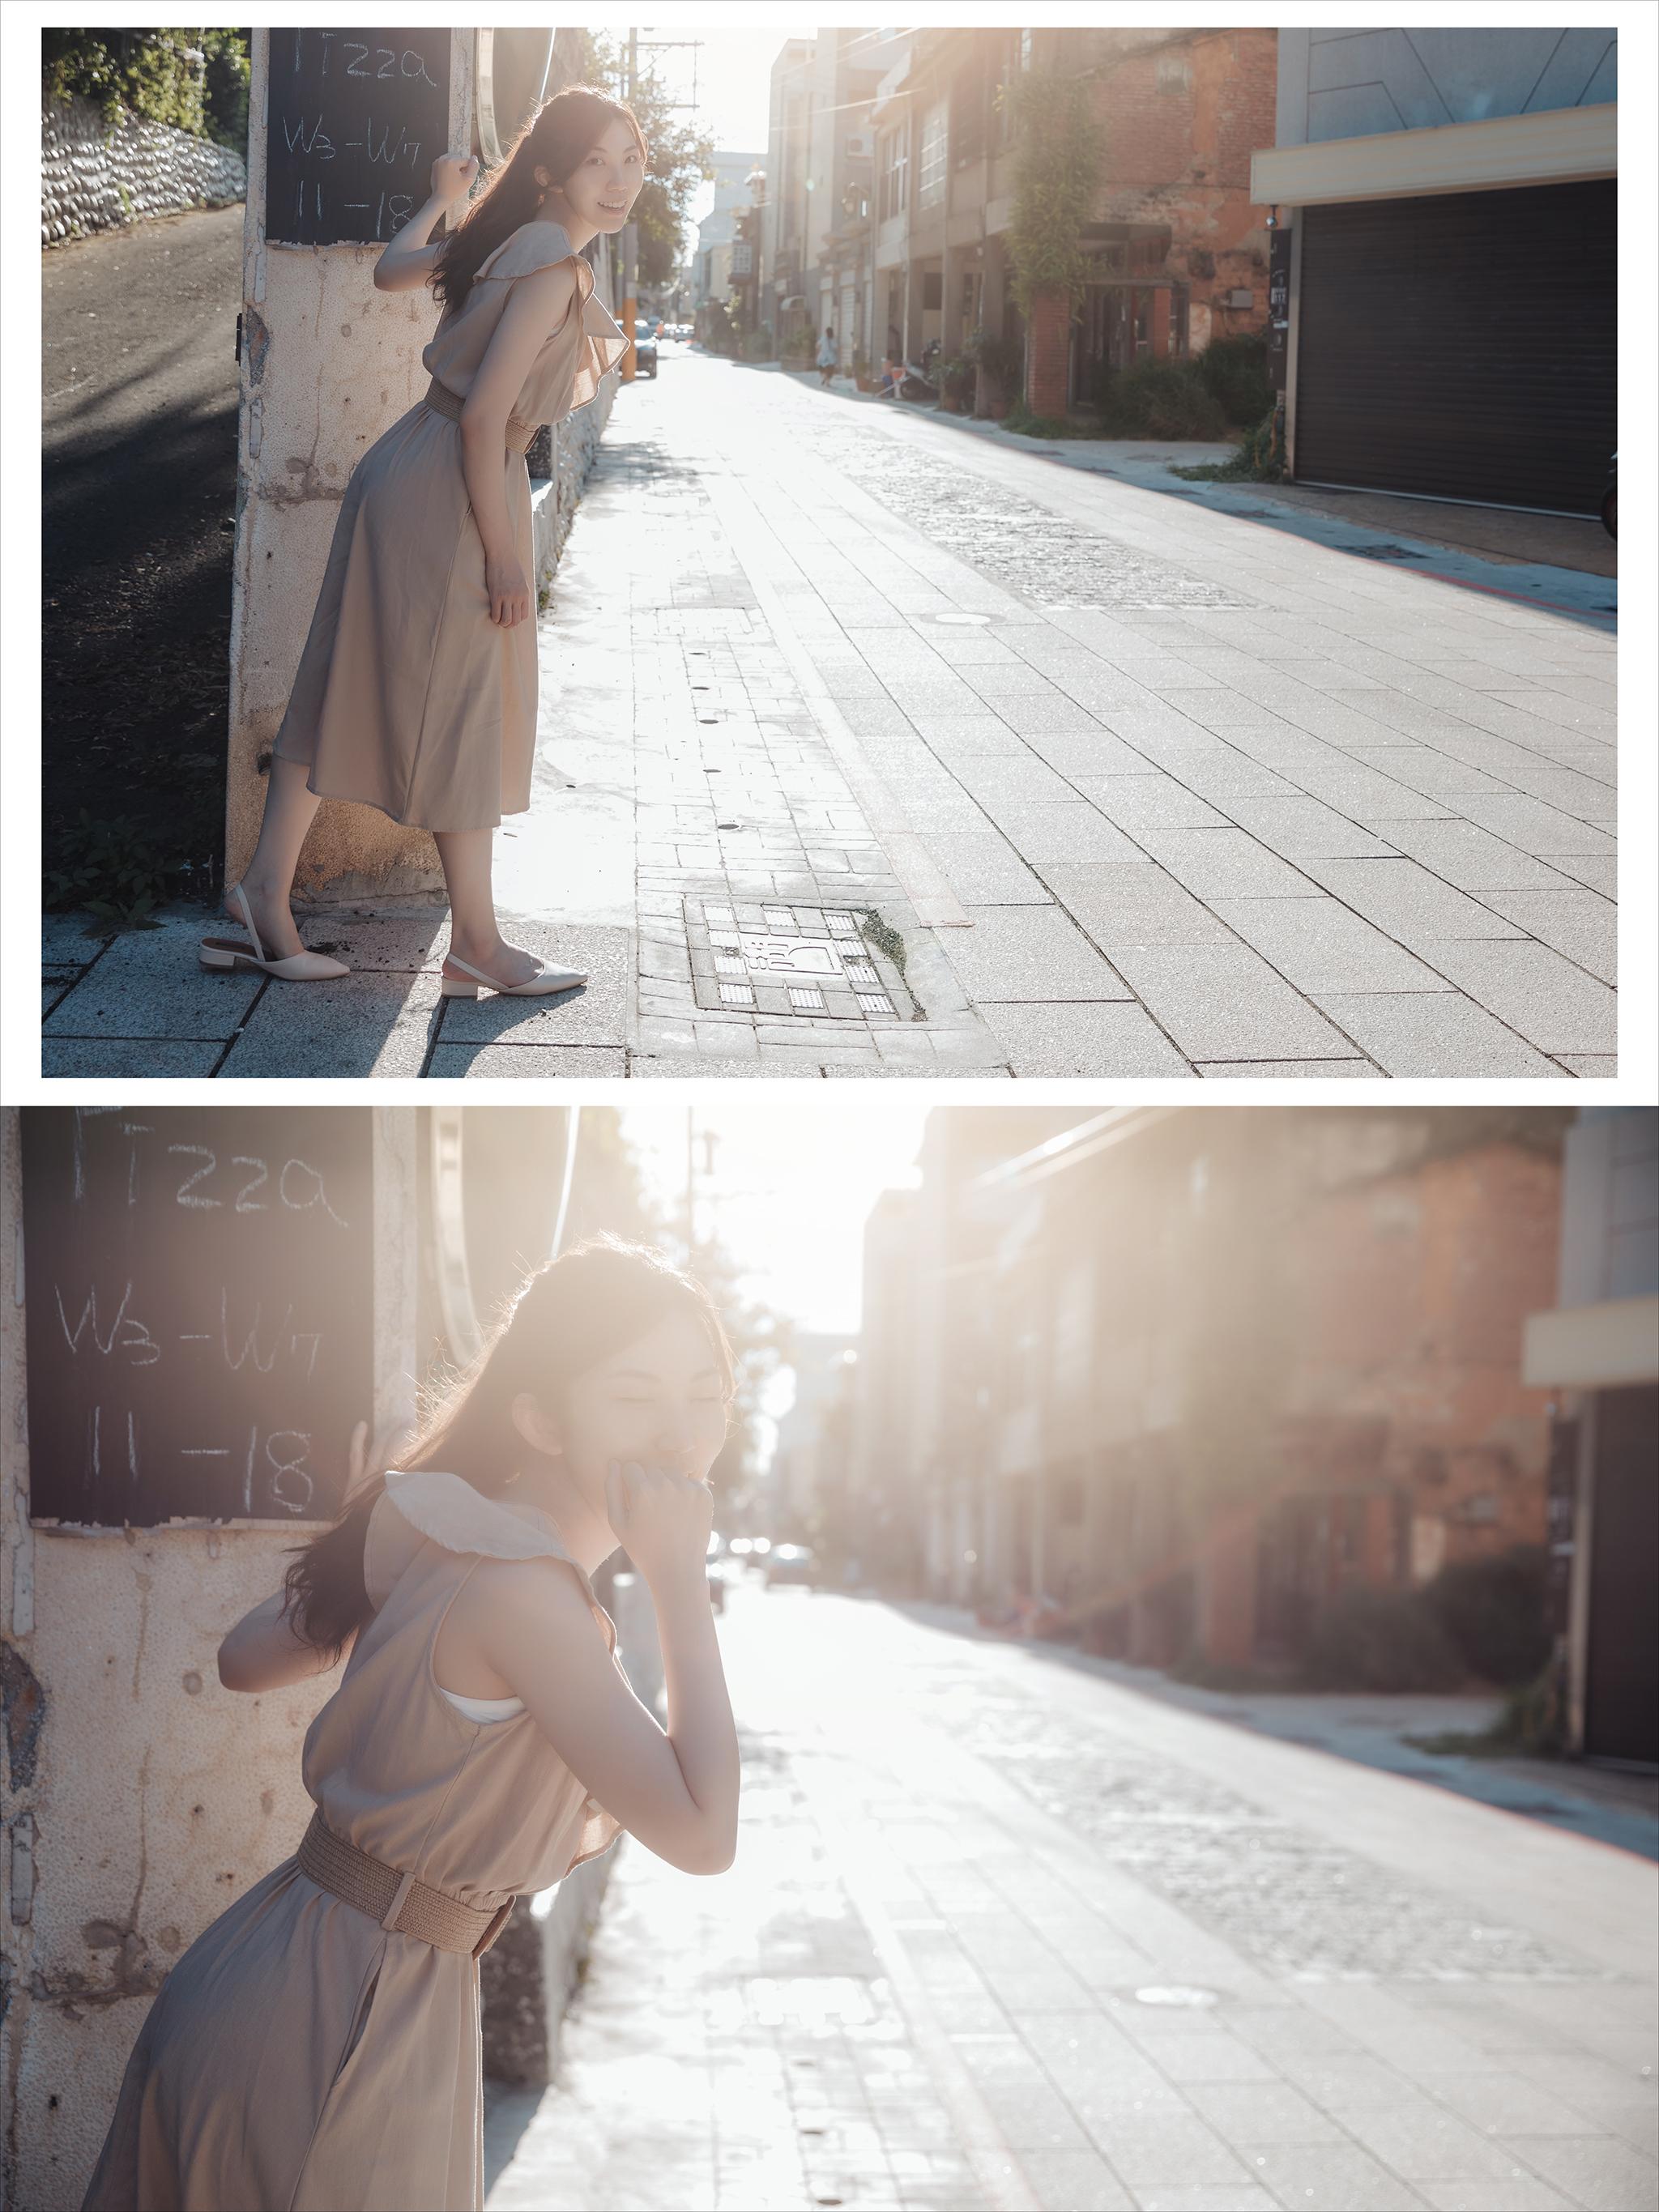 50143265826 54d11ed148 o - 【夏季寫真】+Shan+EP2